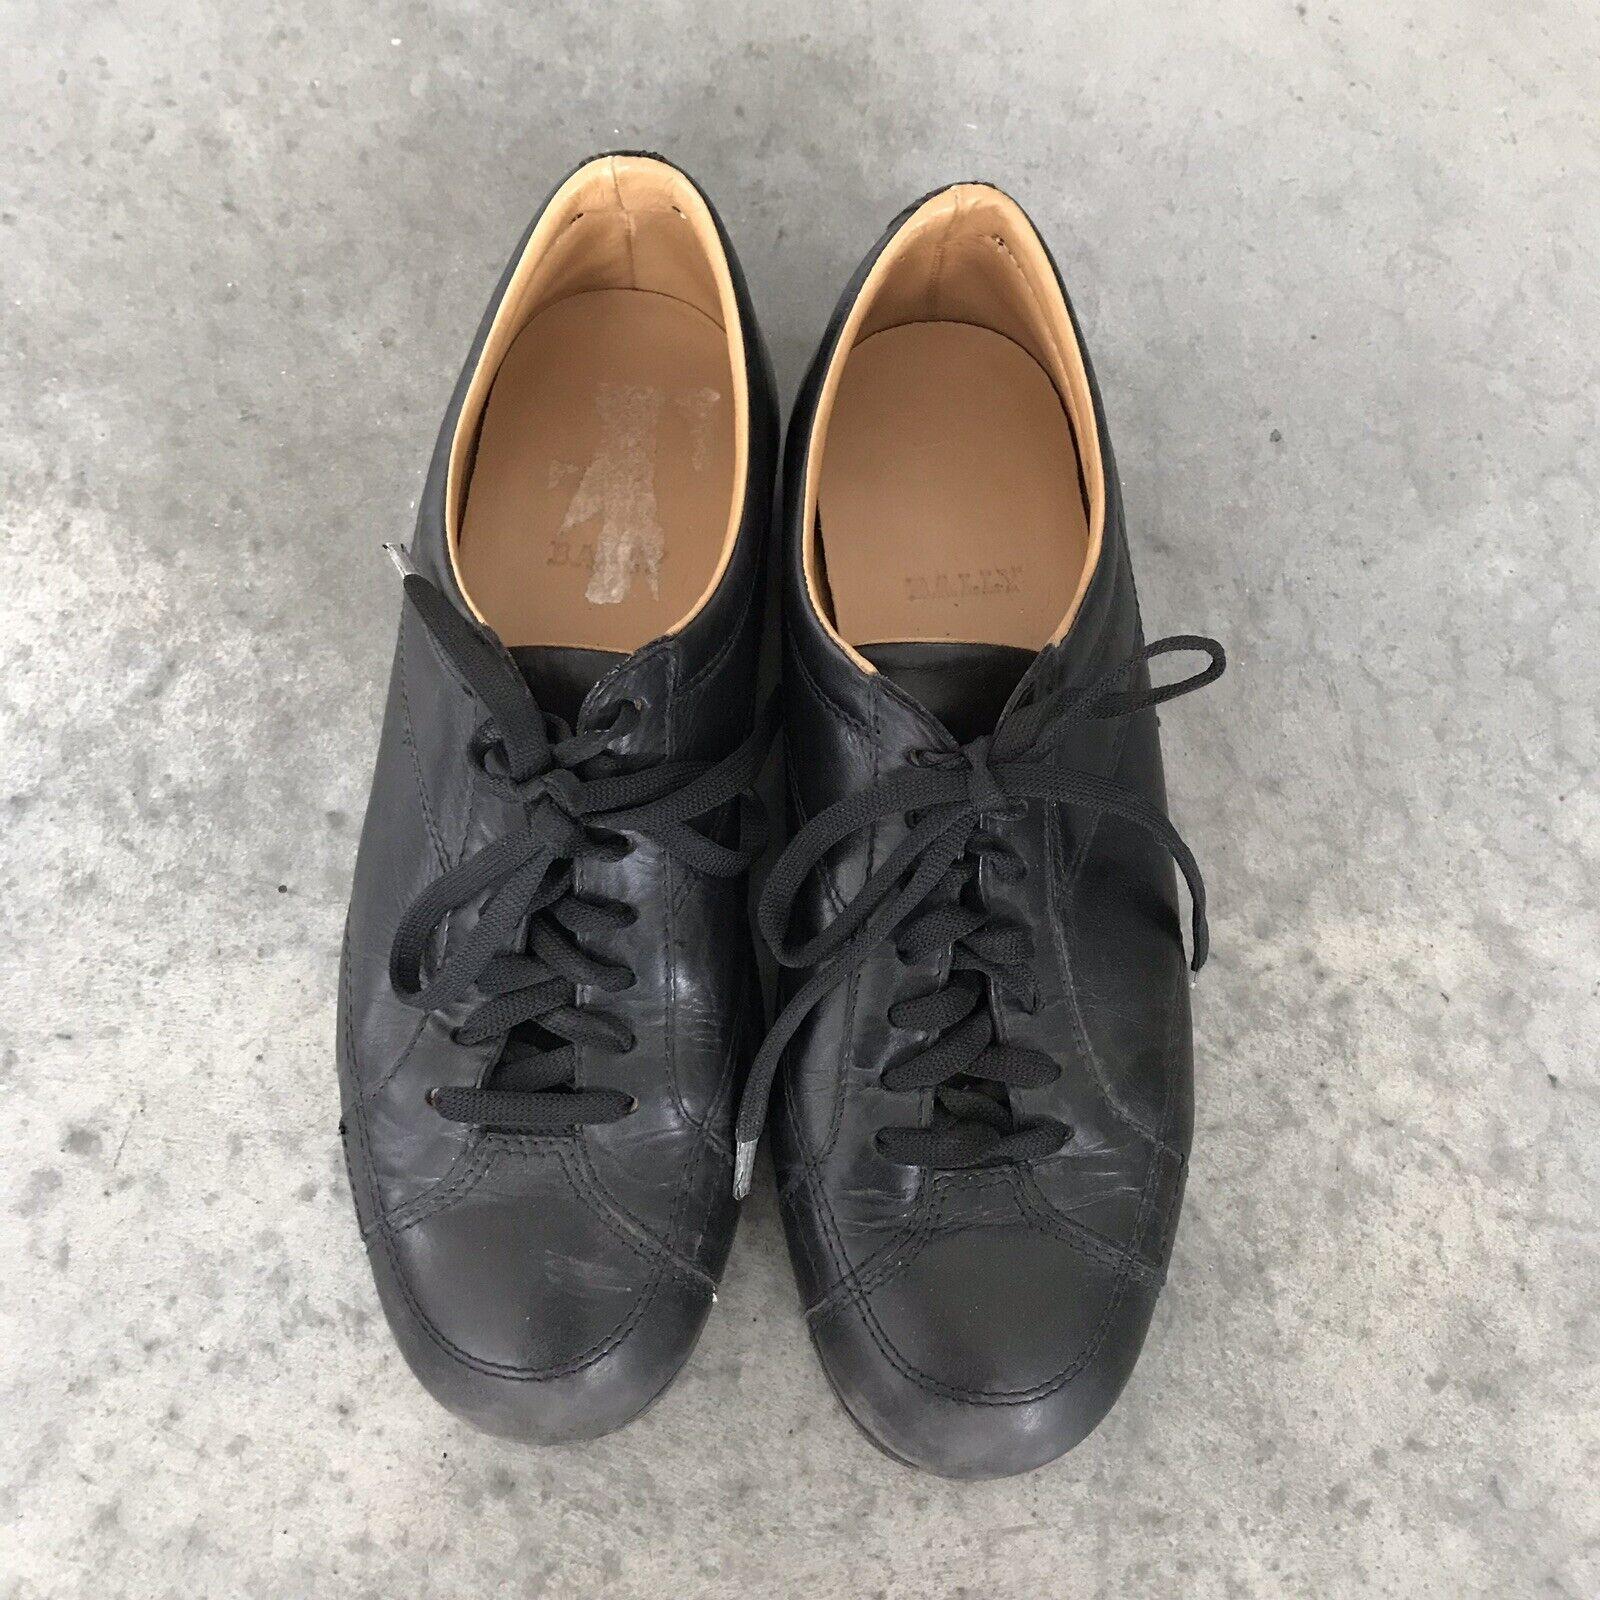 Bally Mujer Cuero Negro Moda Zapatillas Talla 39 9